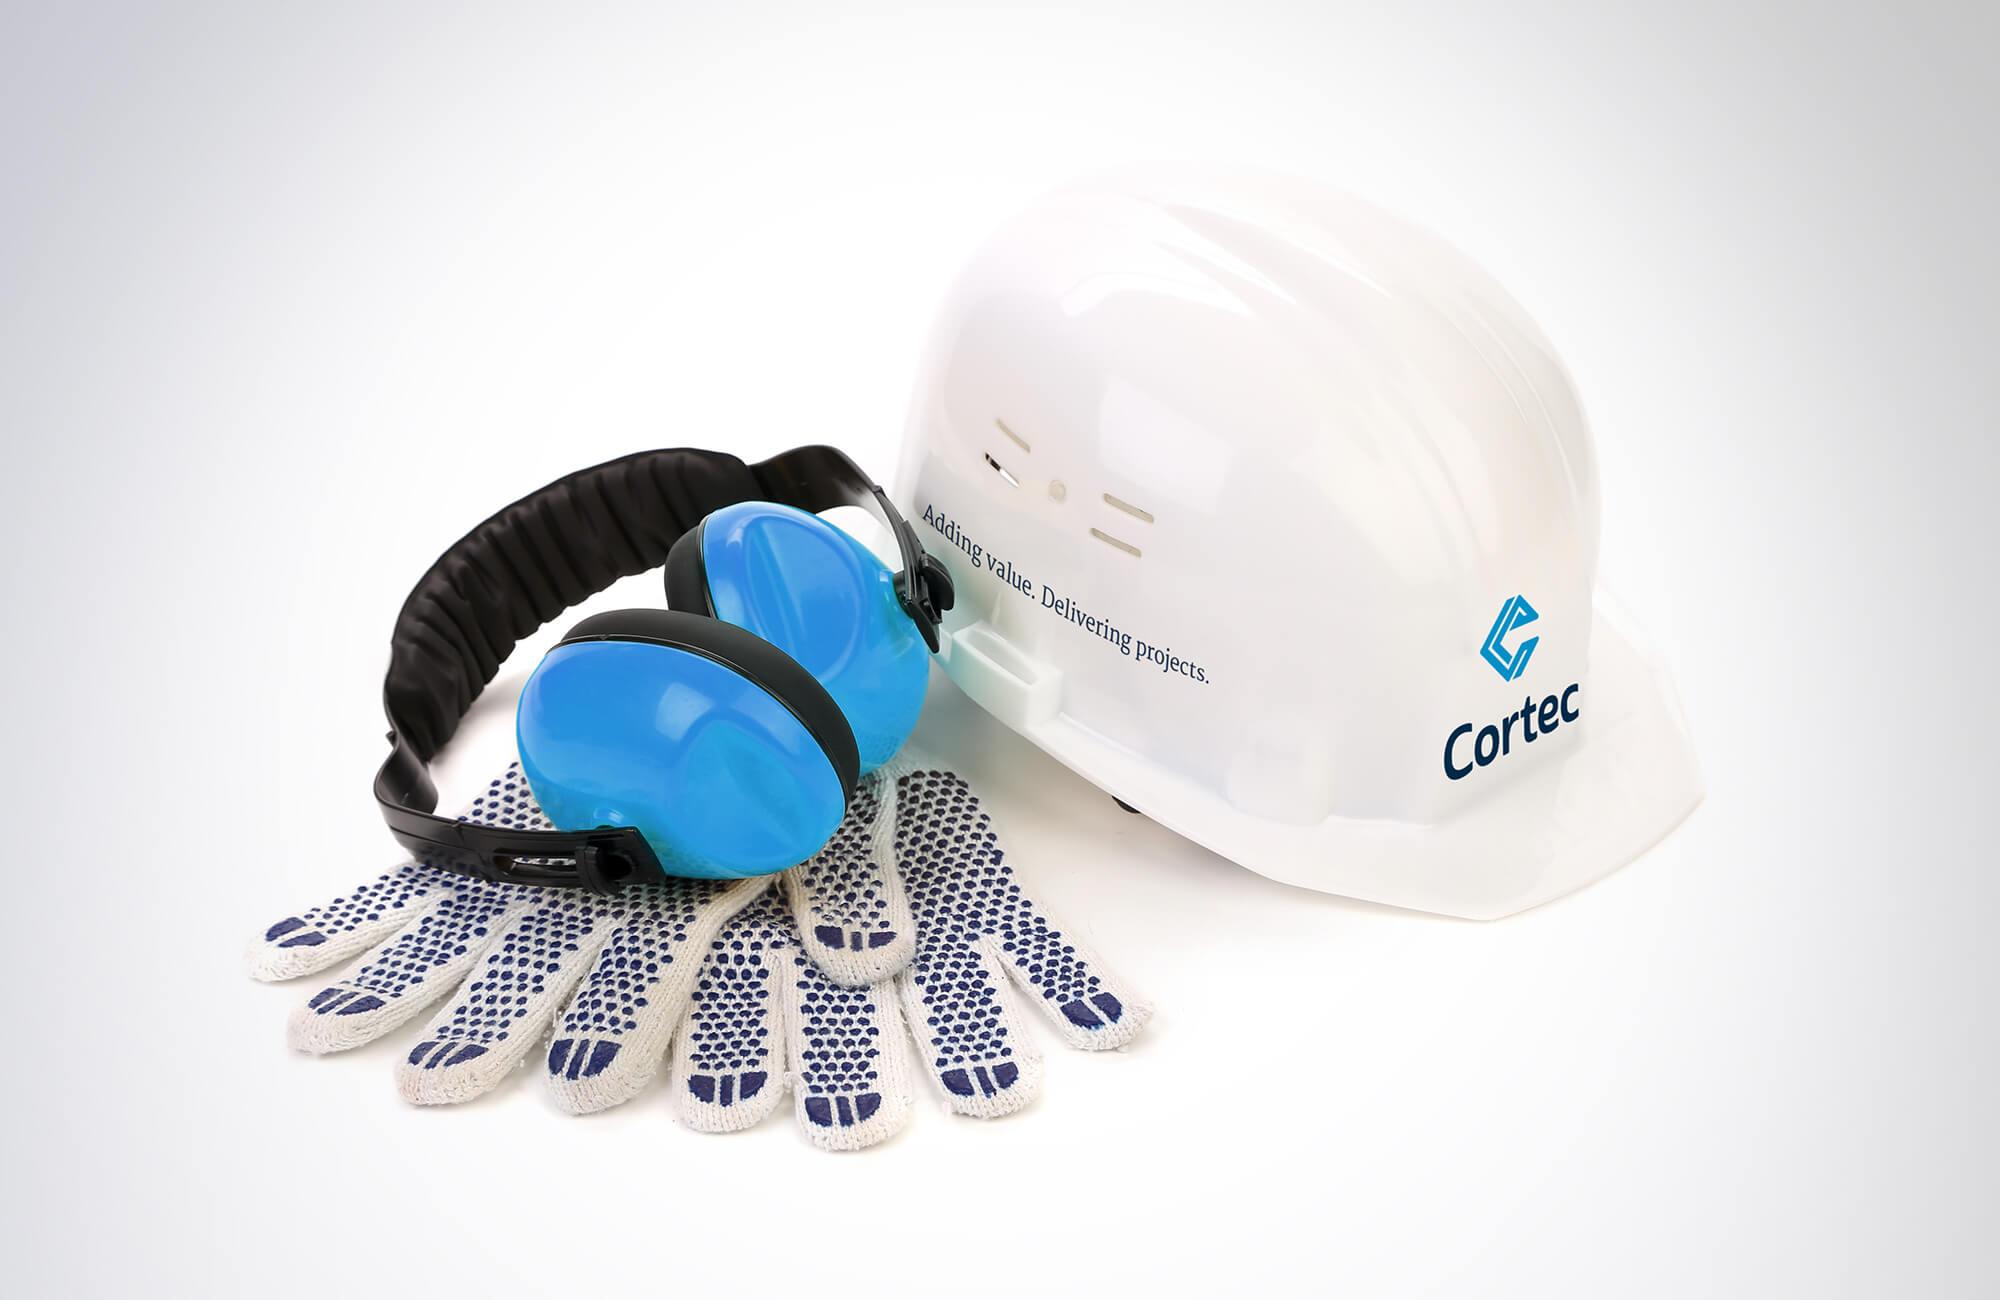 Cortec Branded Hard Hat Design Concept